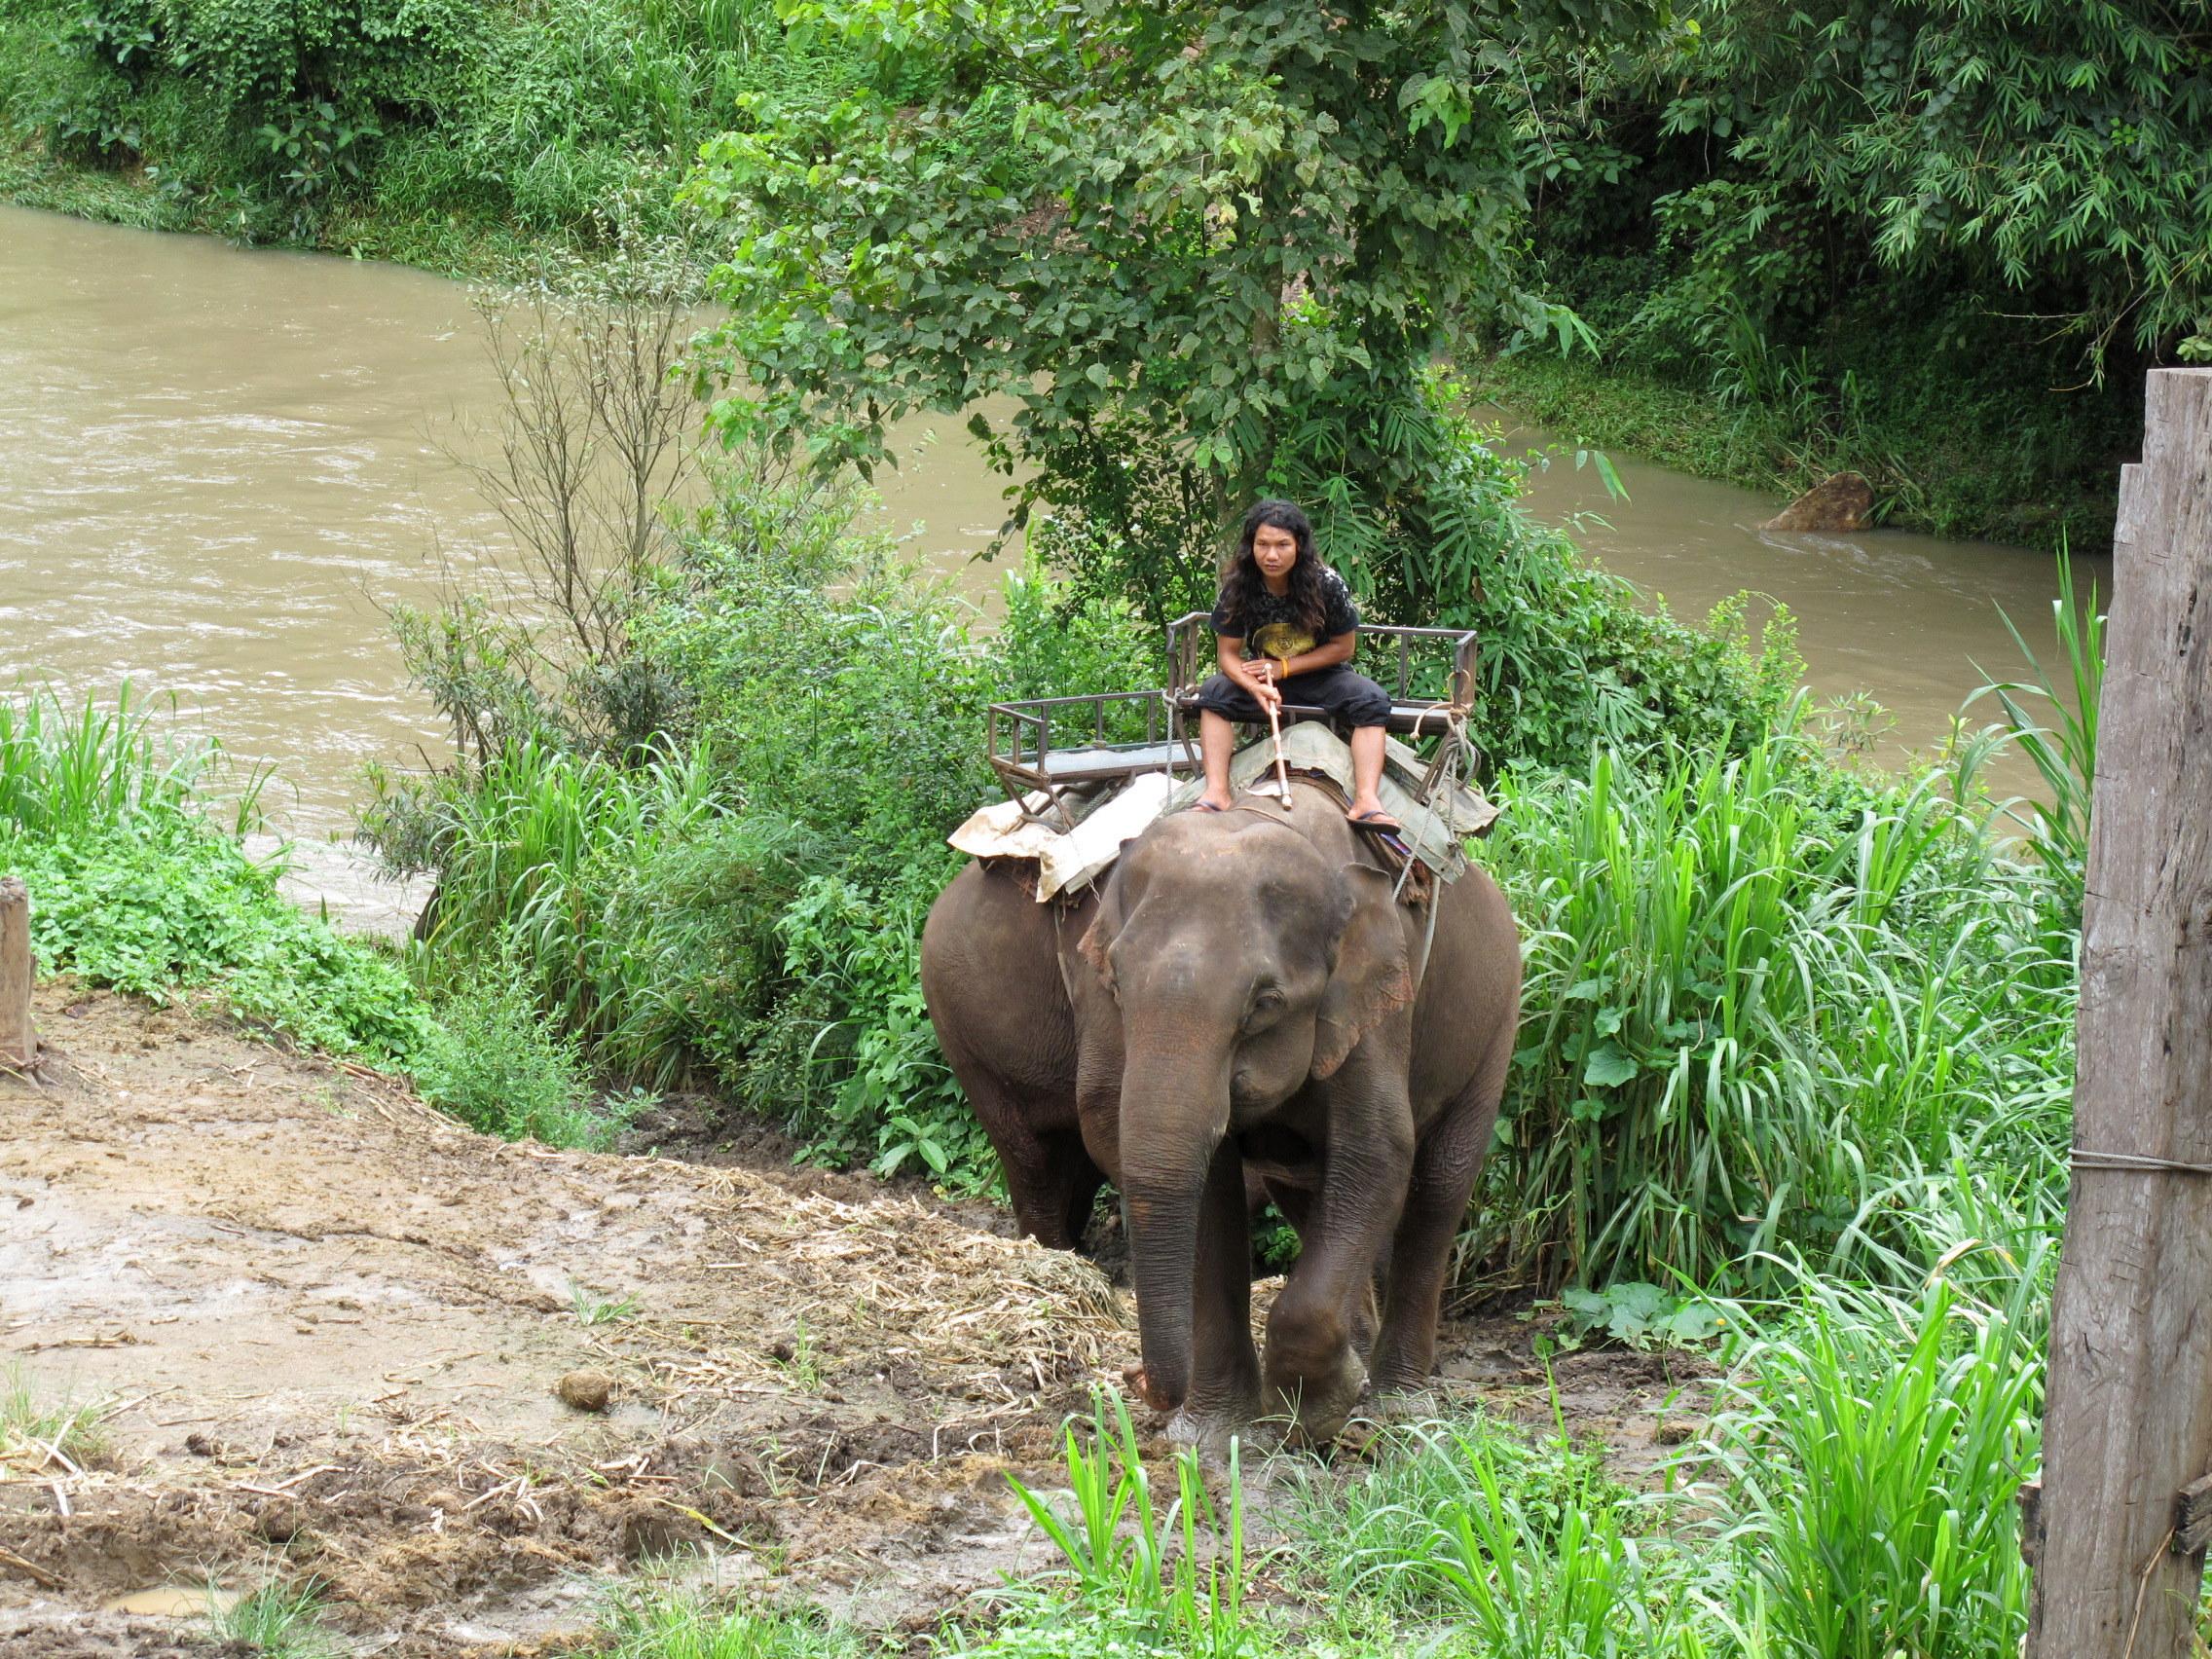 thailandia trekking dorso elefante